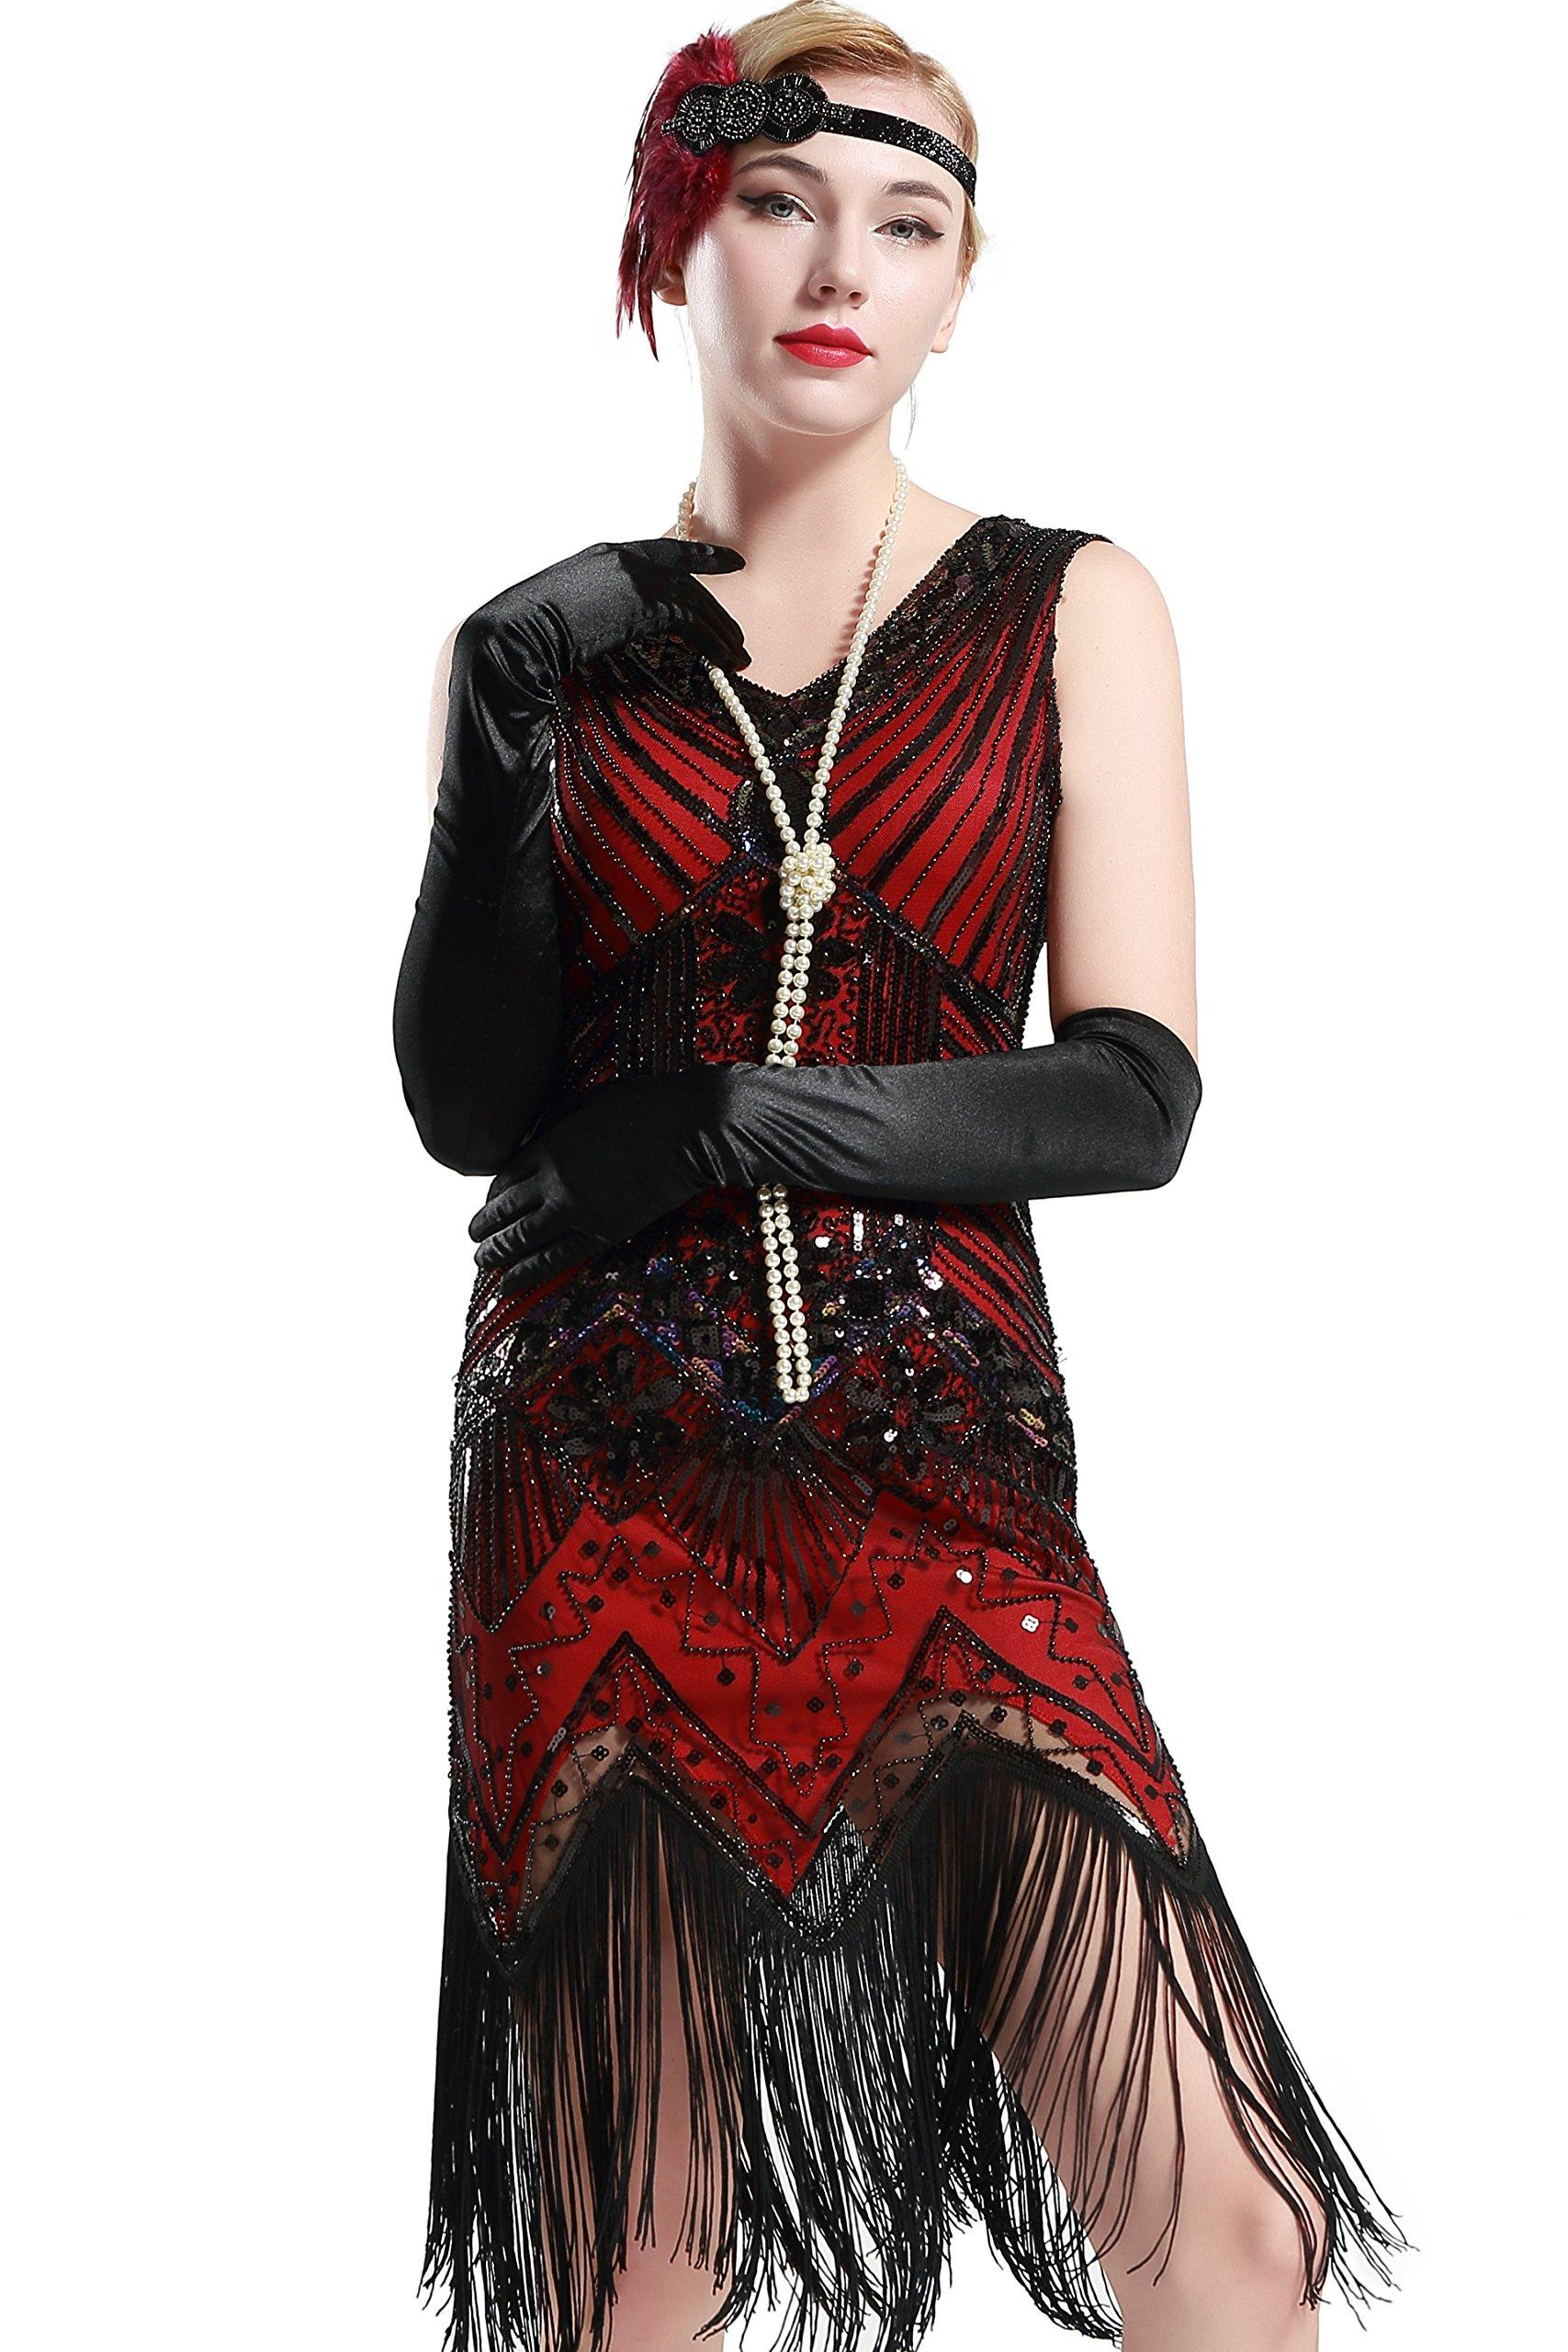 Red Dress - Women's One Shoulder Sleeveless Knee Length Side Split Fashion Bandage Dress